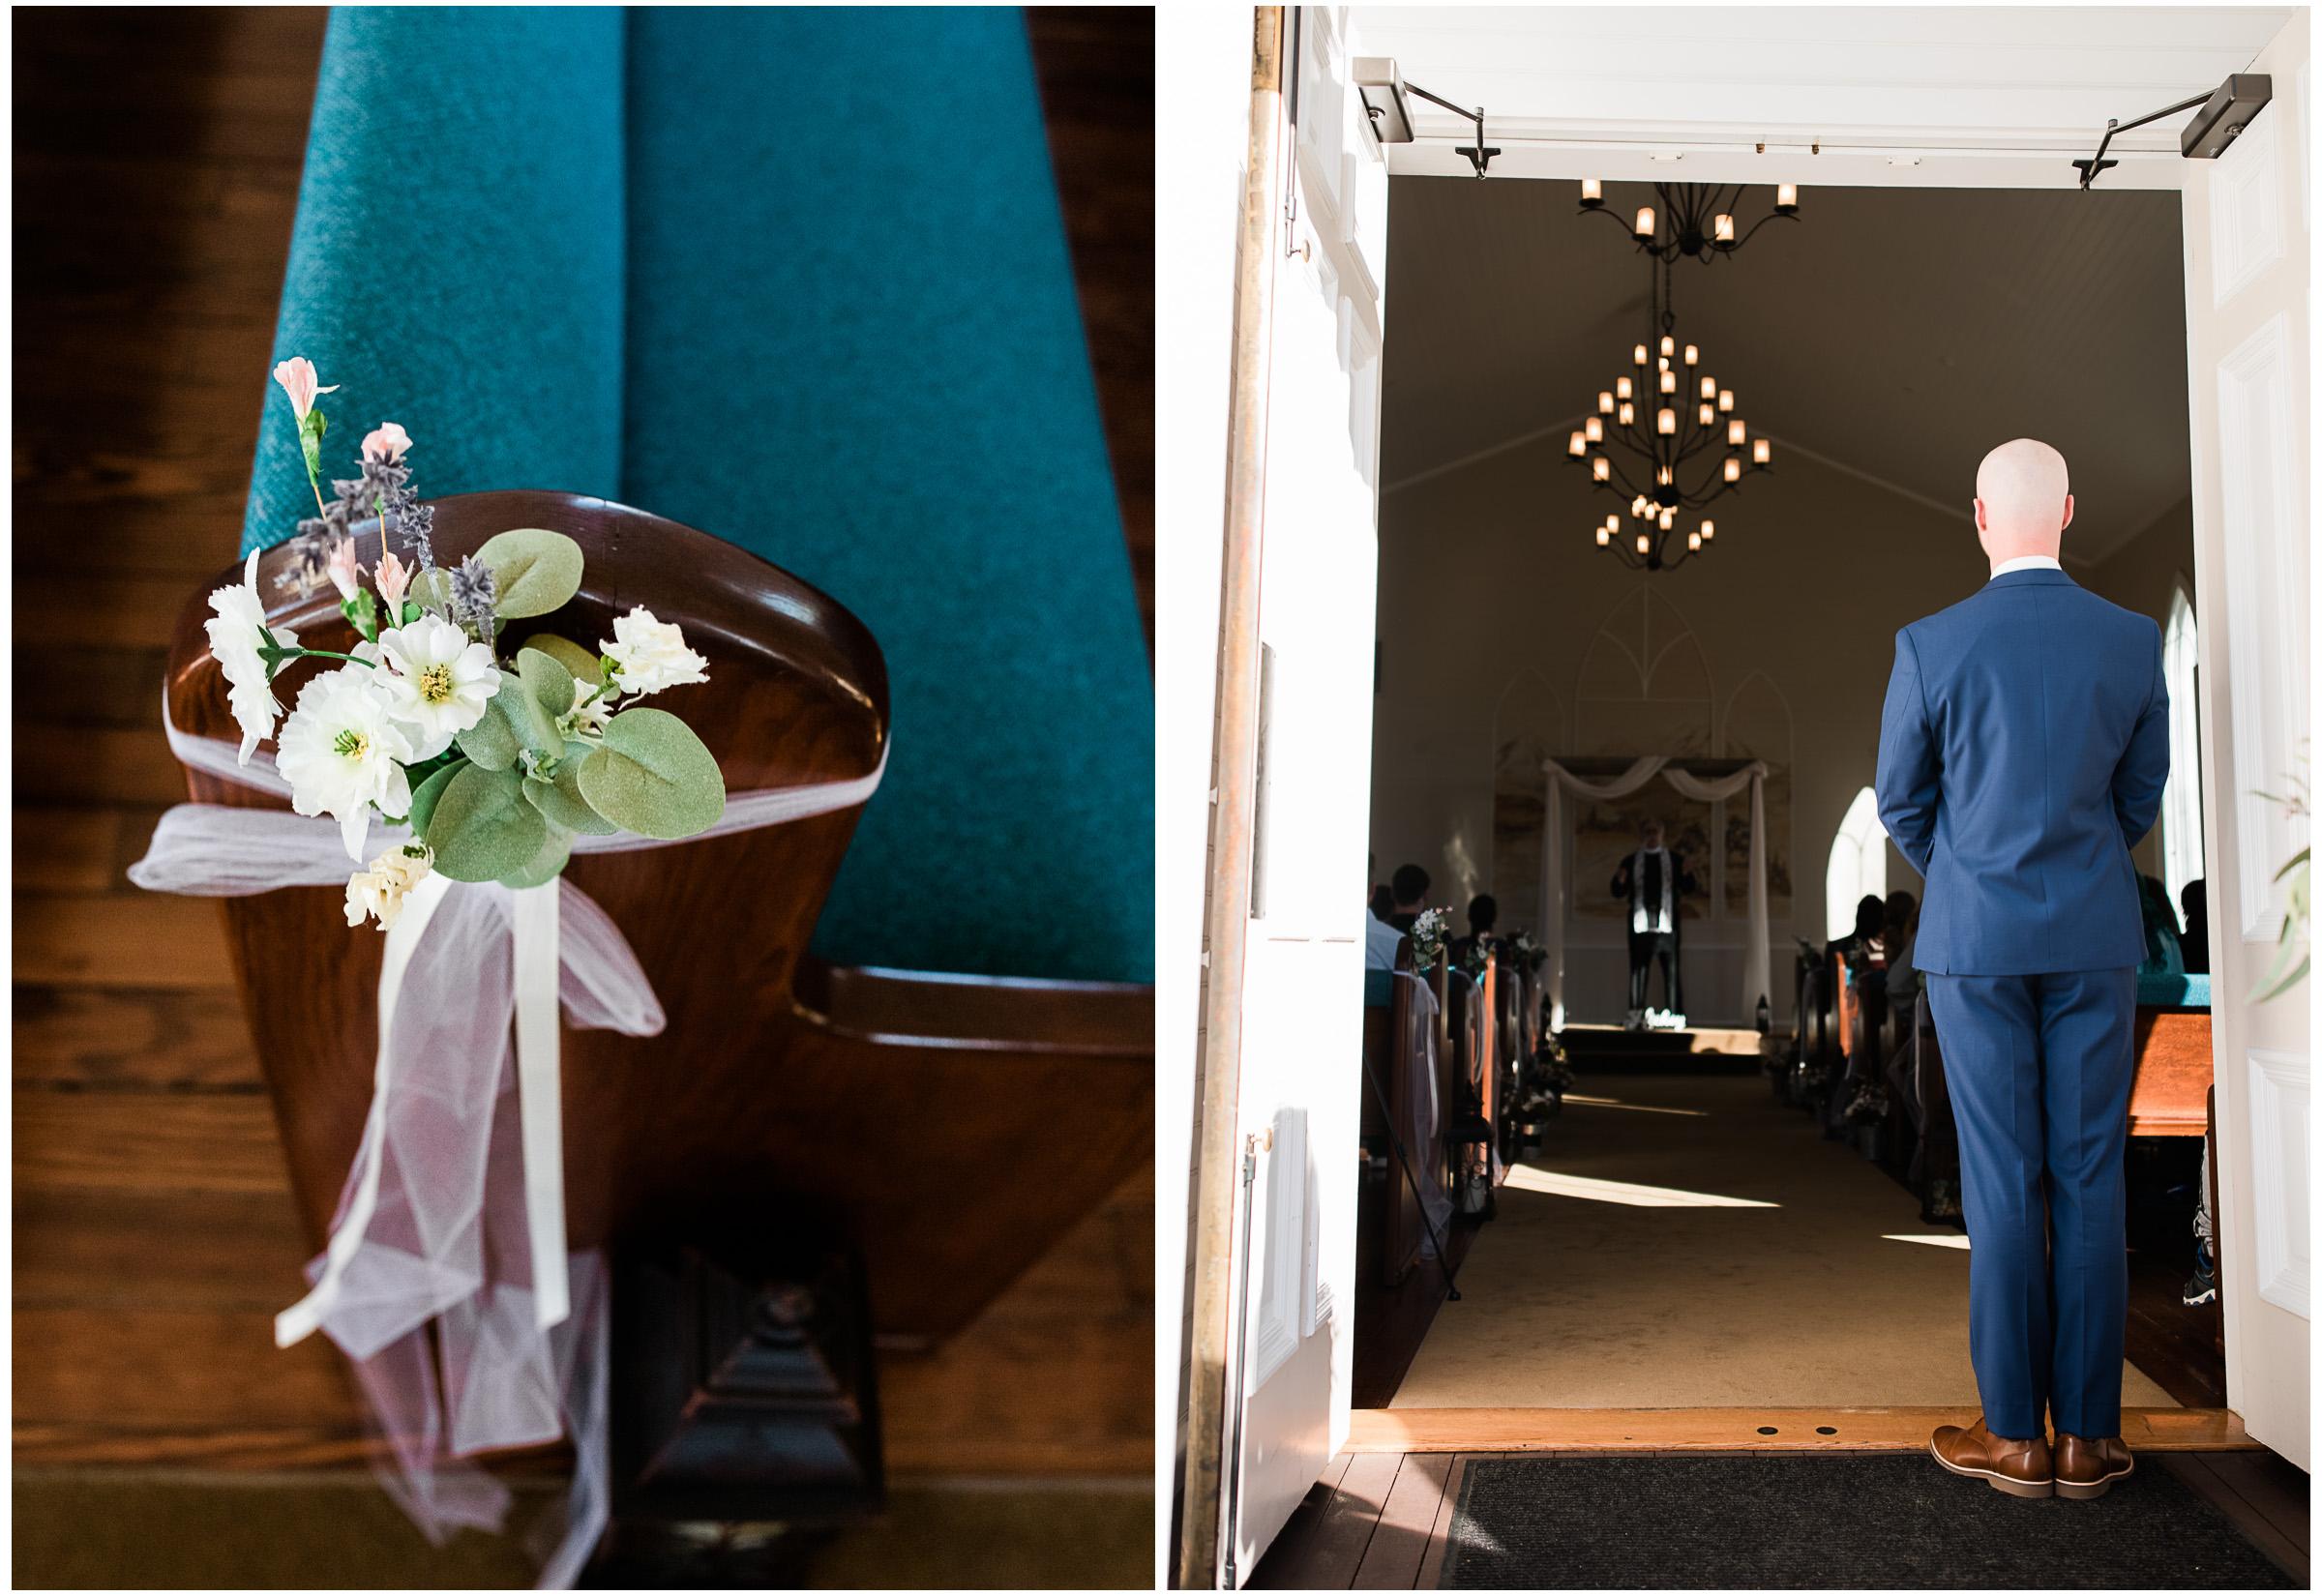 Sacramento Wedding - Sacramento Photographer - Justin Wilcox Photography - 8.jpg